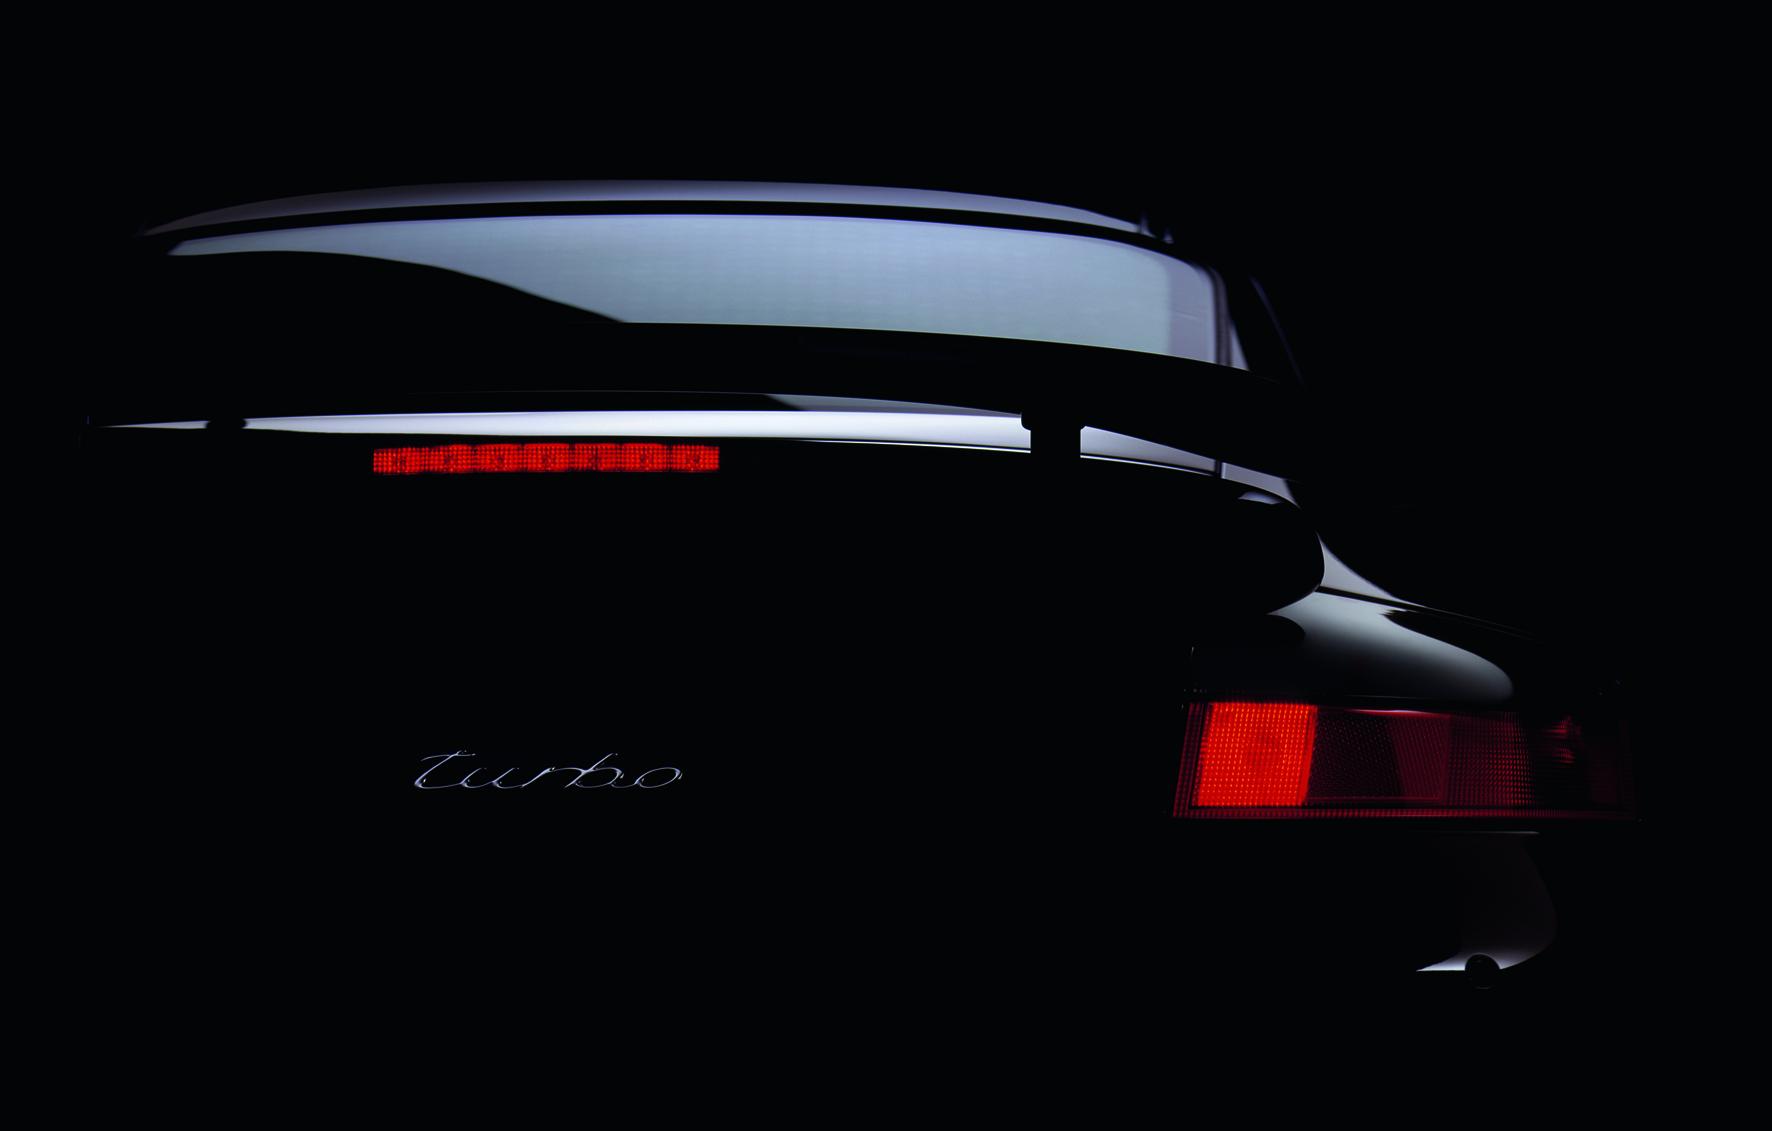 Porsche 911 (996), 1997-2006    Photo © 2016 STAUD STUDIOS GmbH. All rights reserved.  www.staudstudios.com